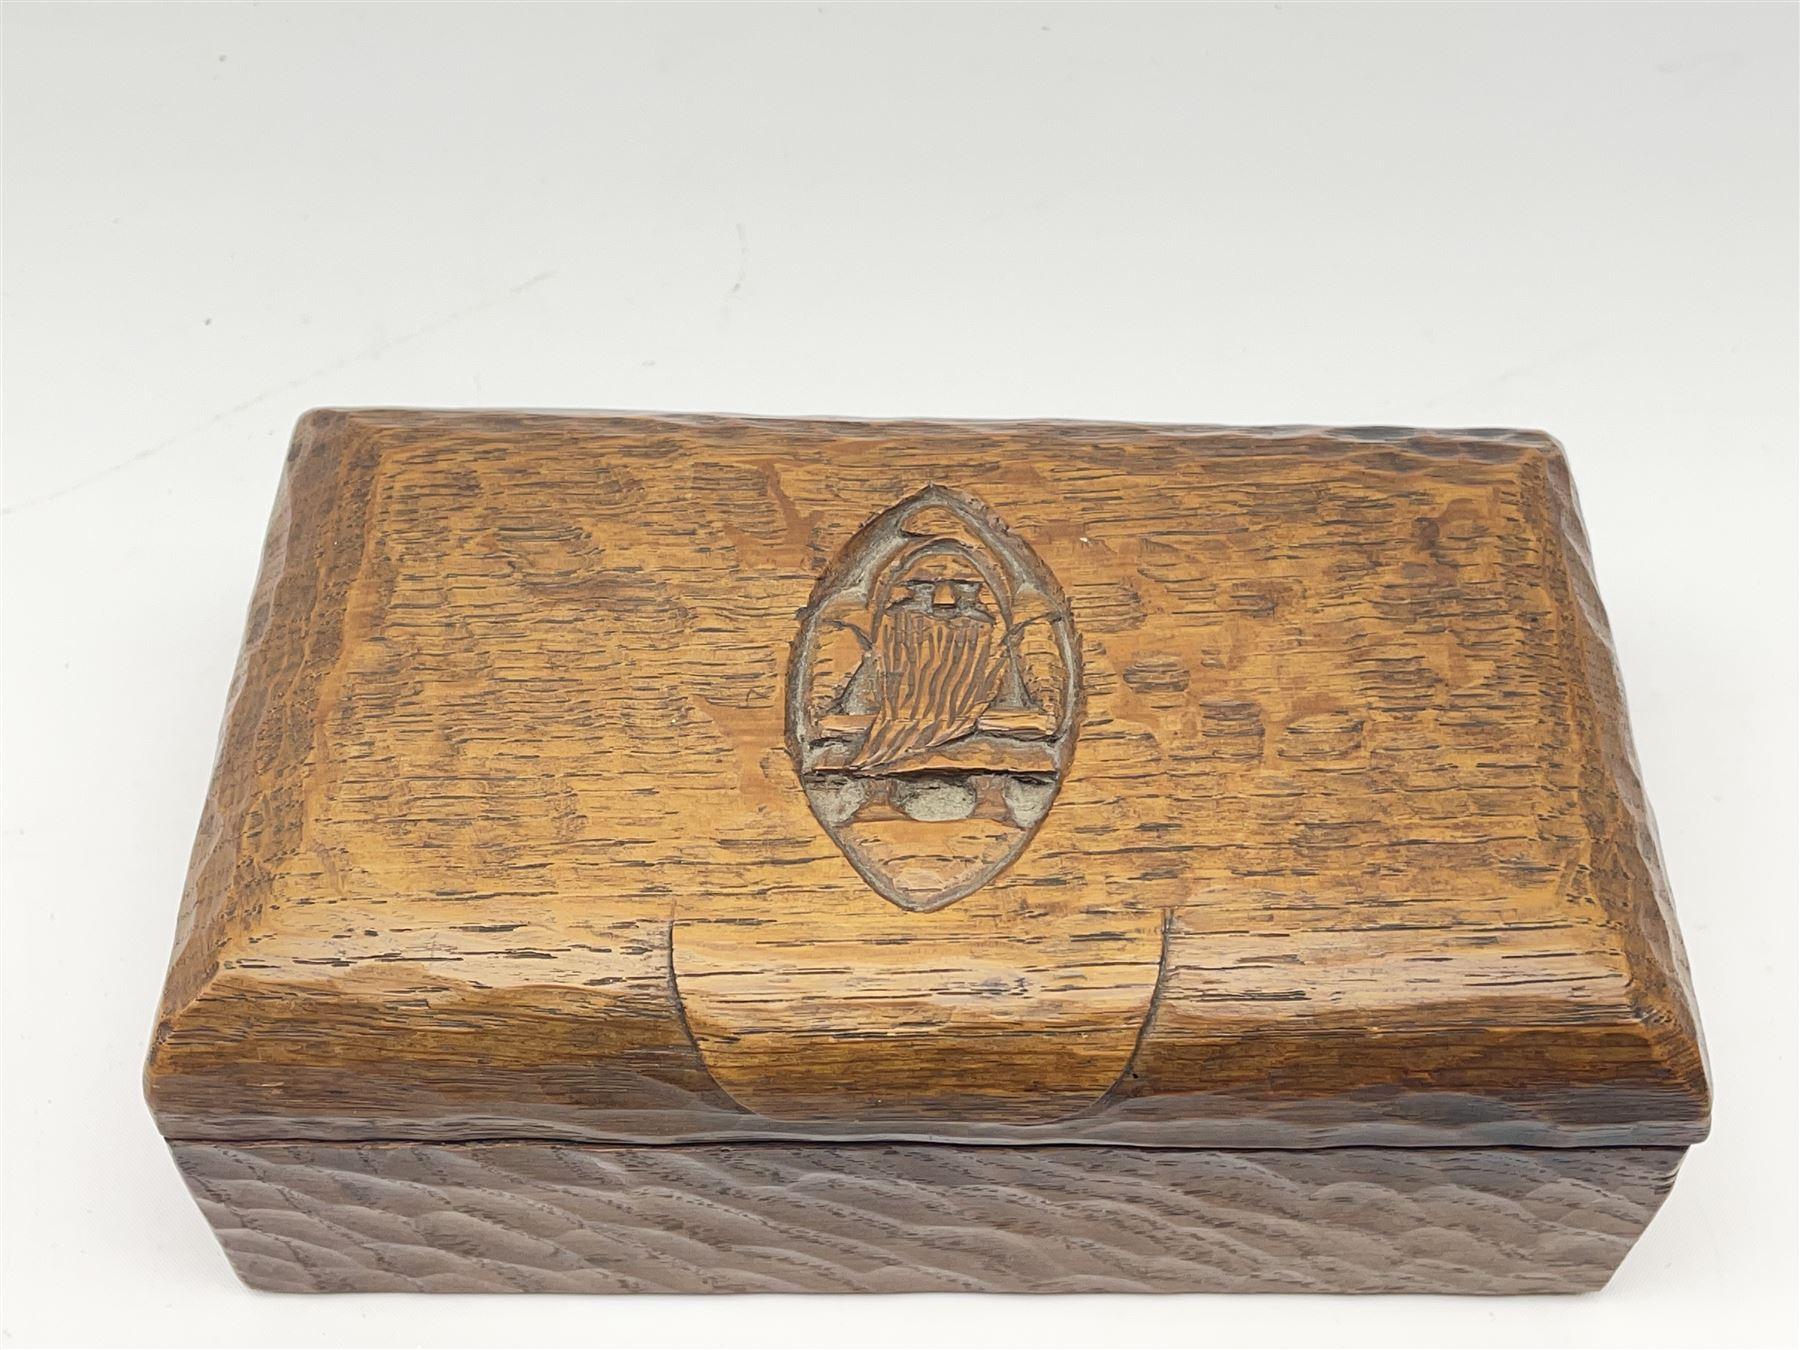 'Gnomeman' tooled oak trinket box - Image 4 of 6